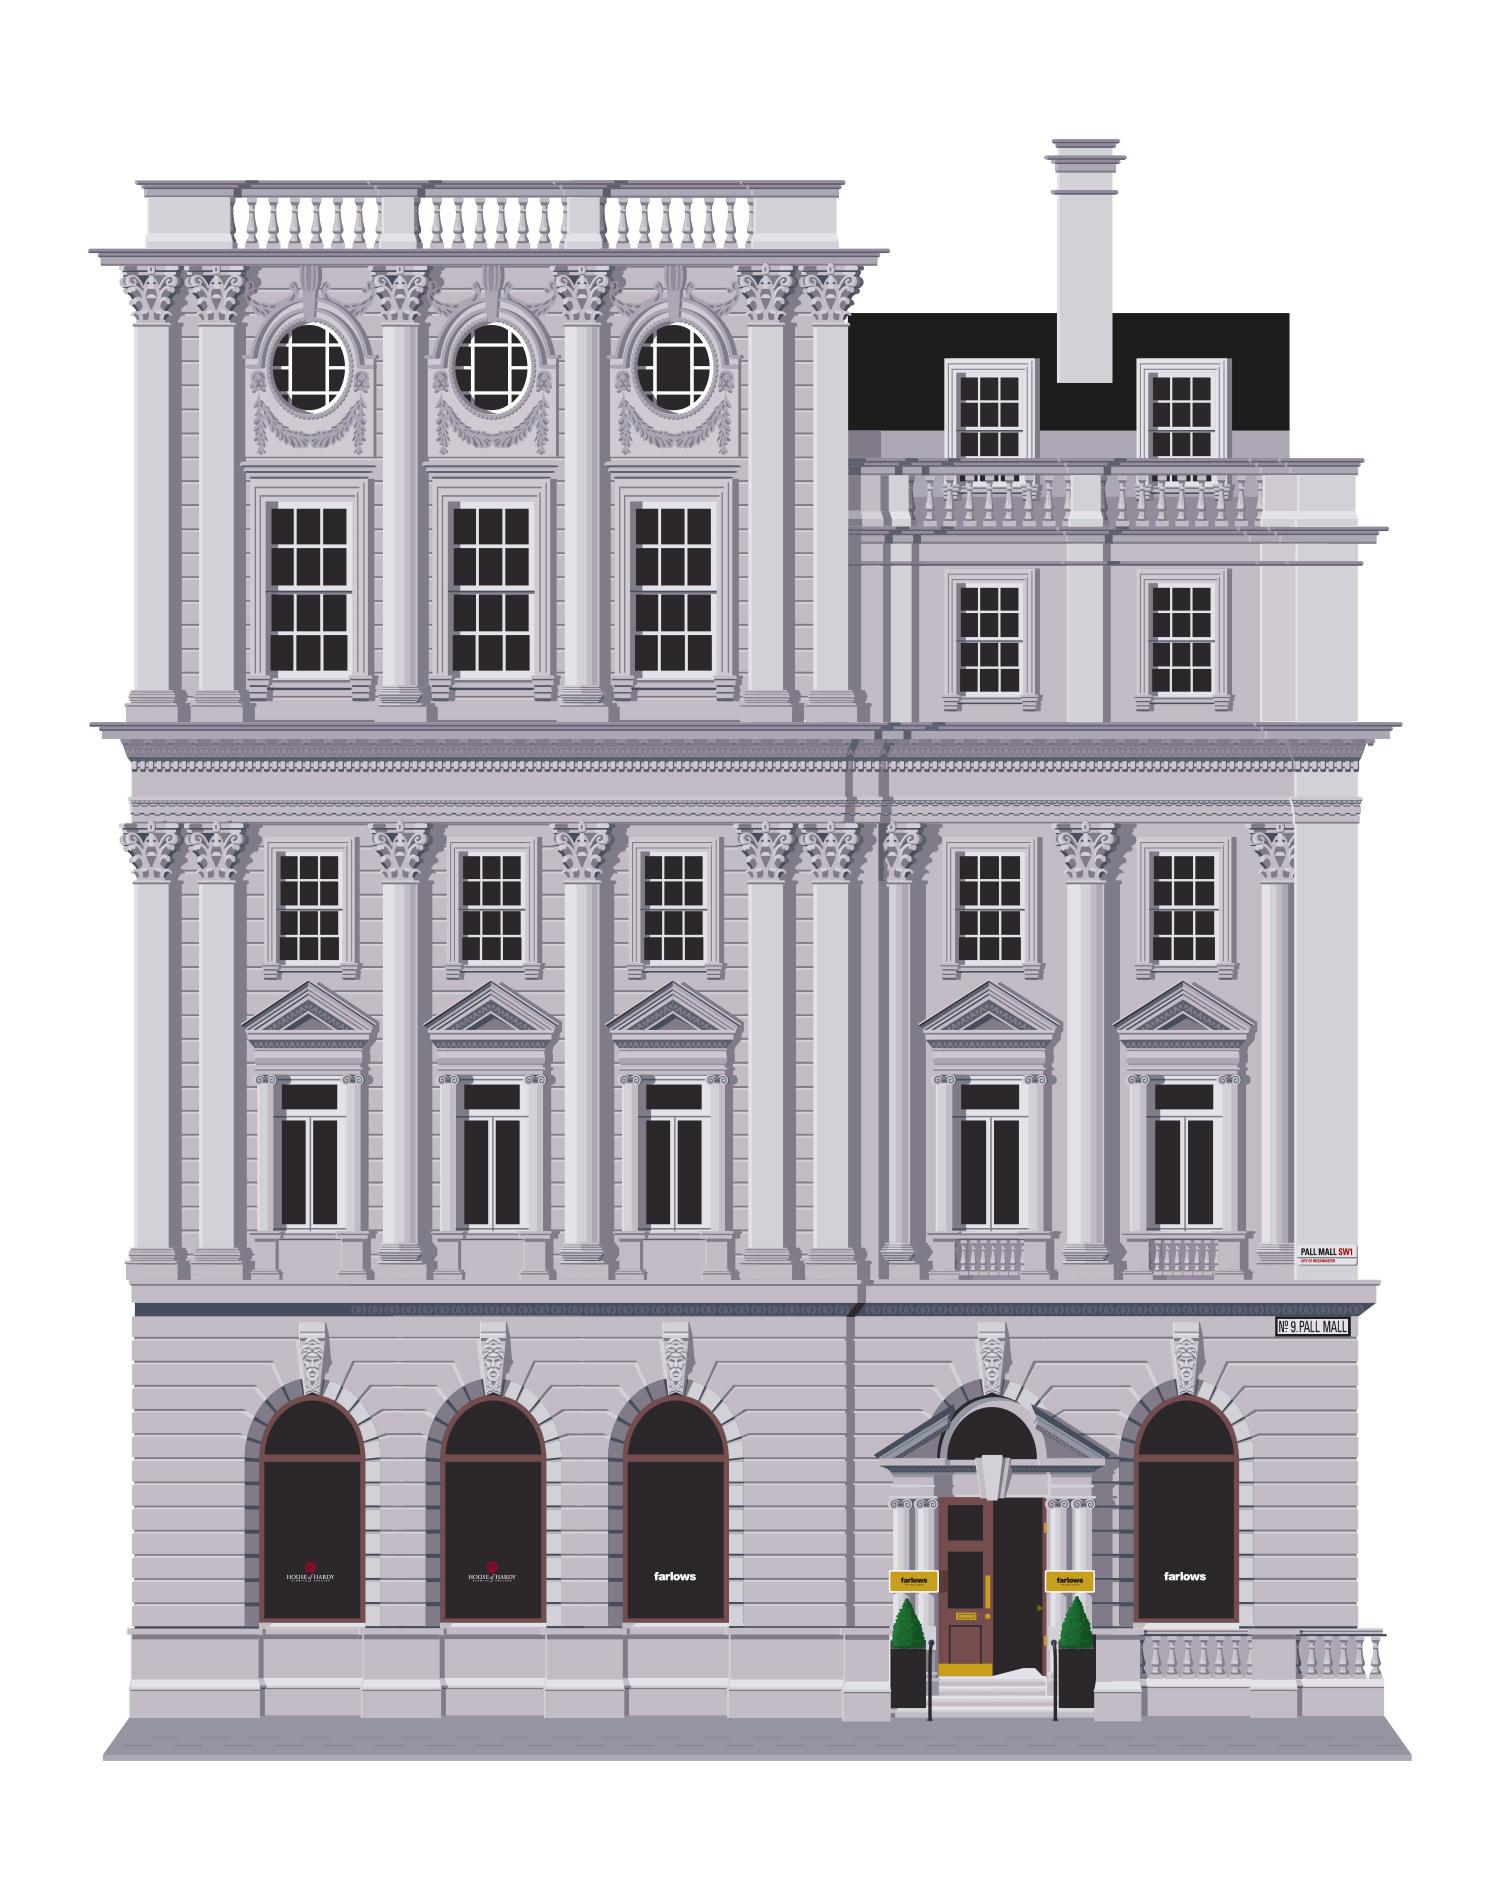 Adobe Illustrator vector drawing